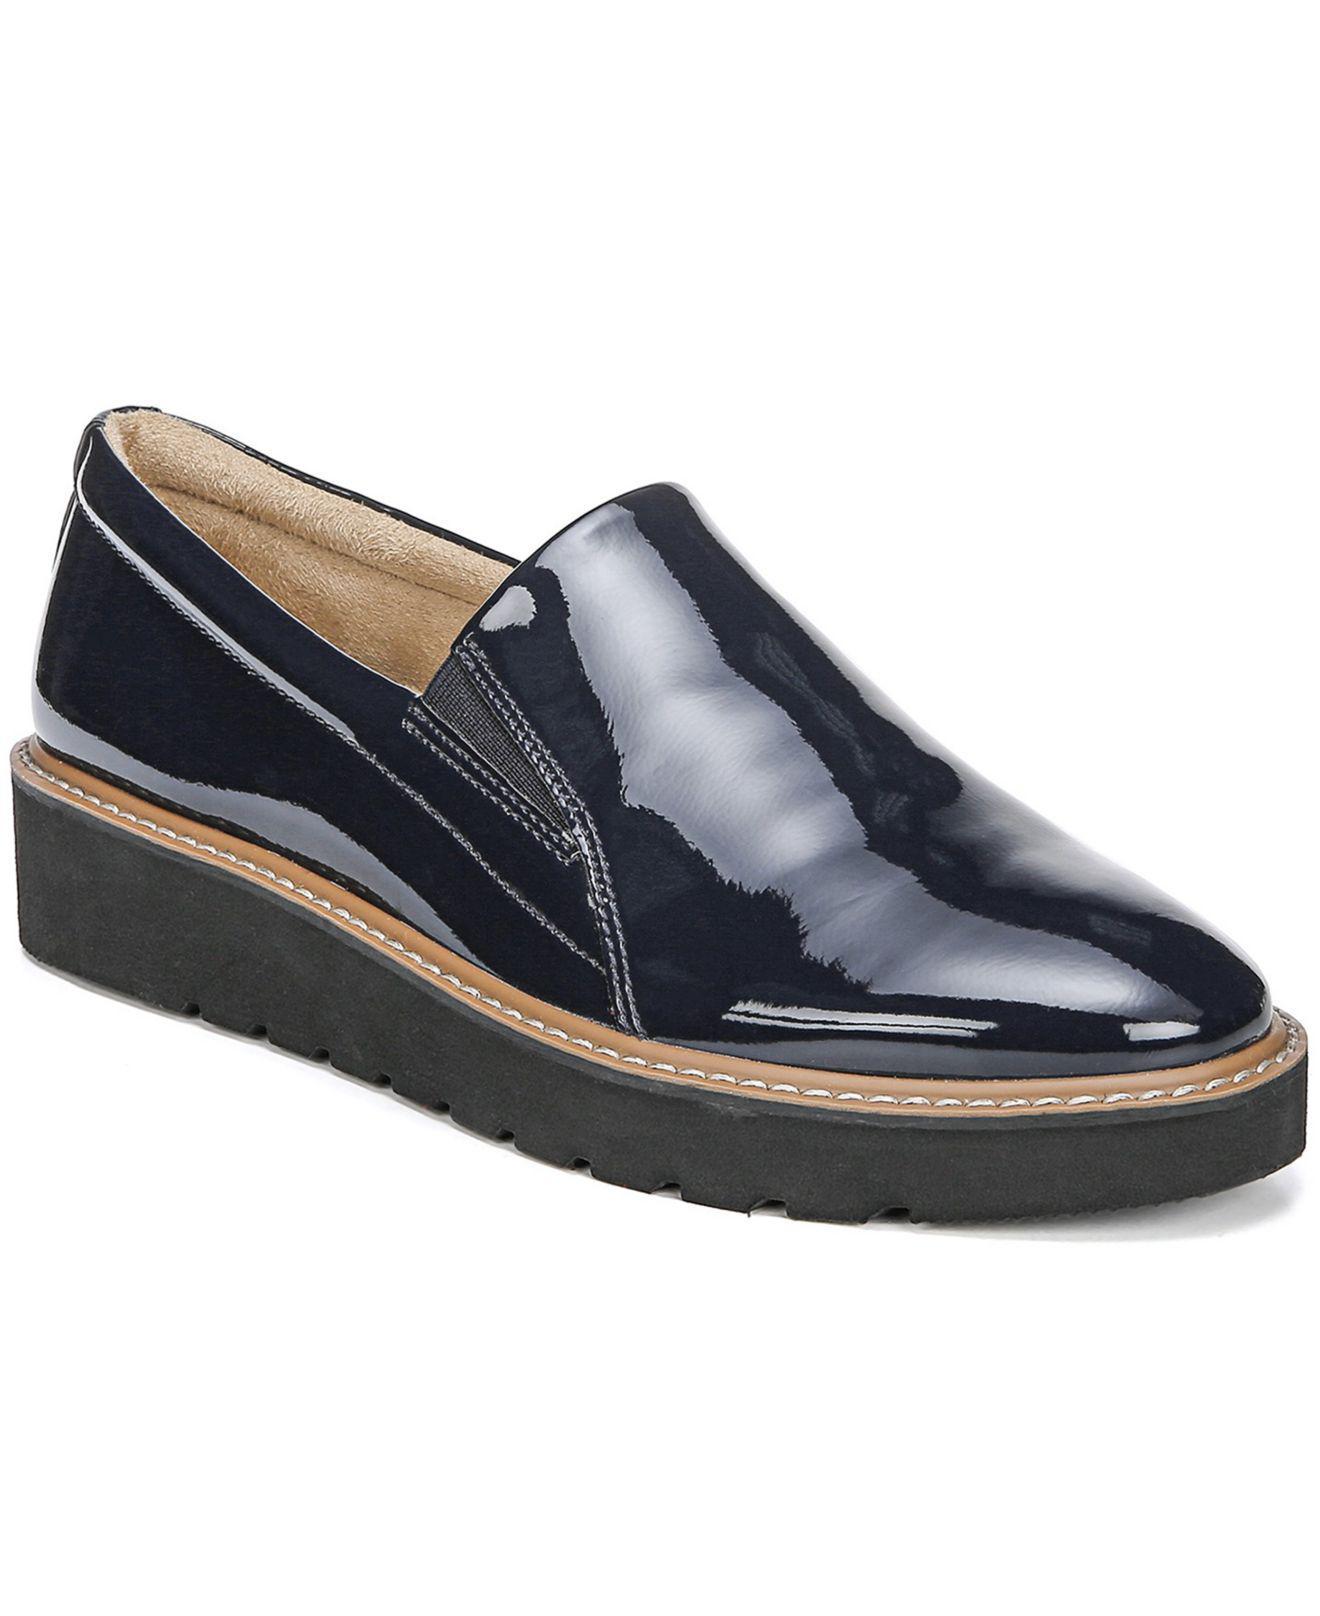 a75a23e50269 Lyst - Naturalizer Effie Platform Loafers in Blue